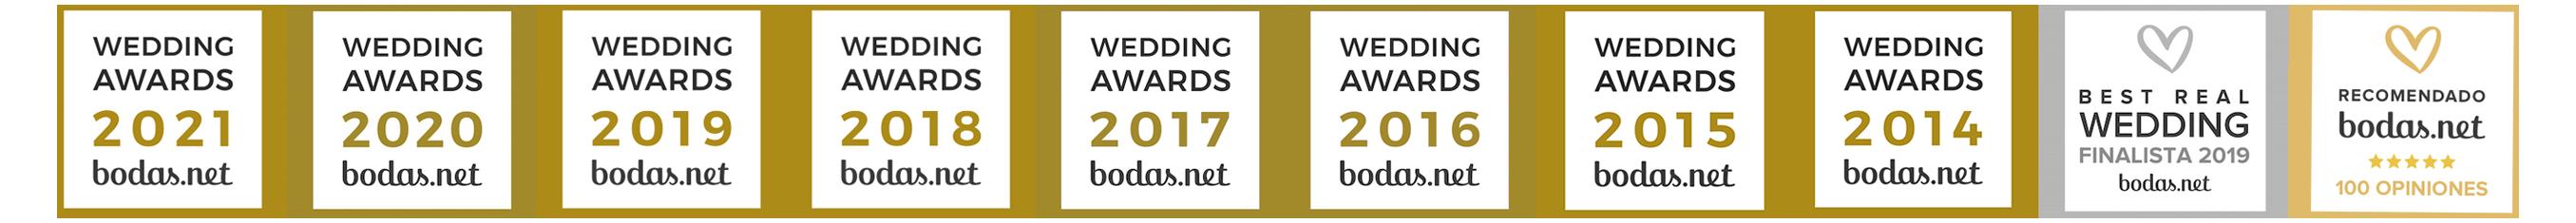 banner wedding awards